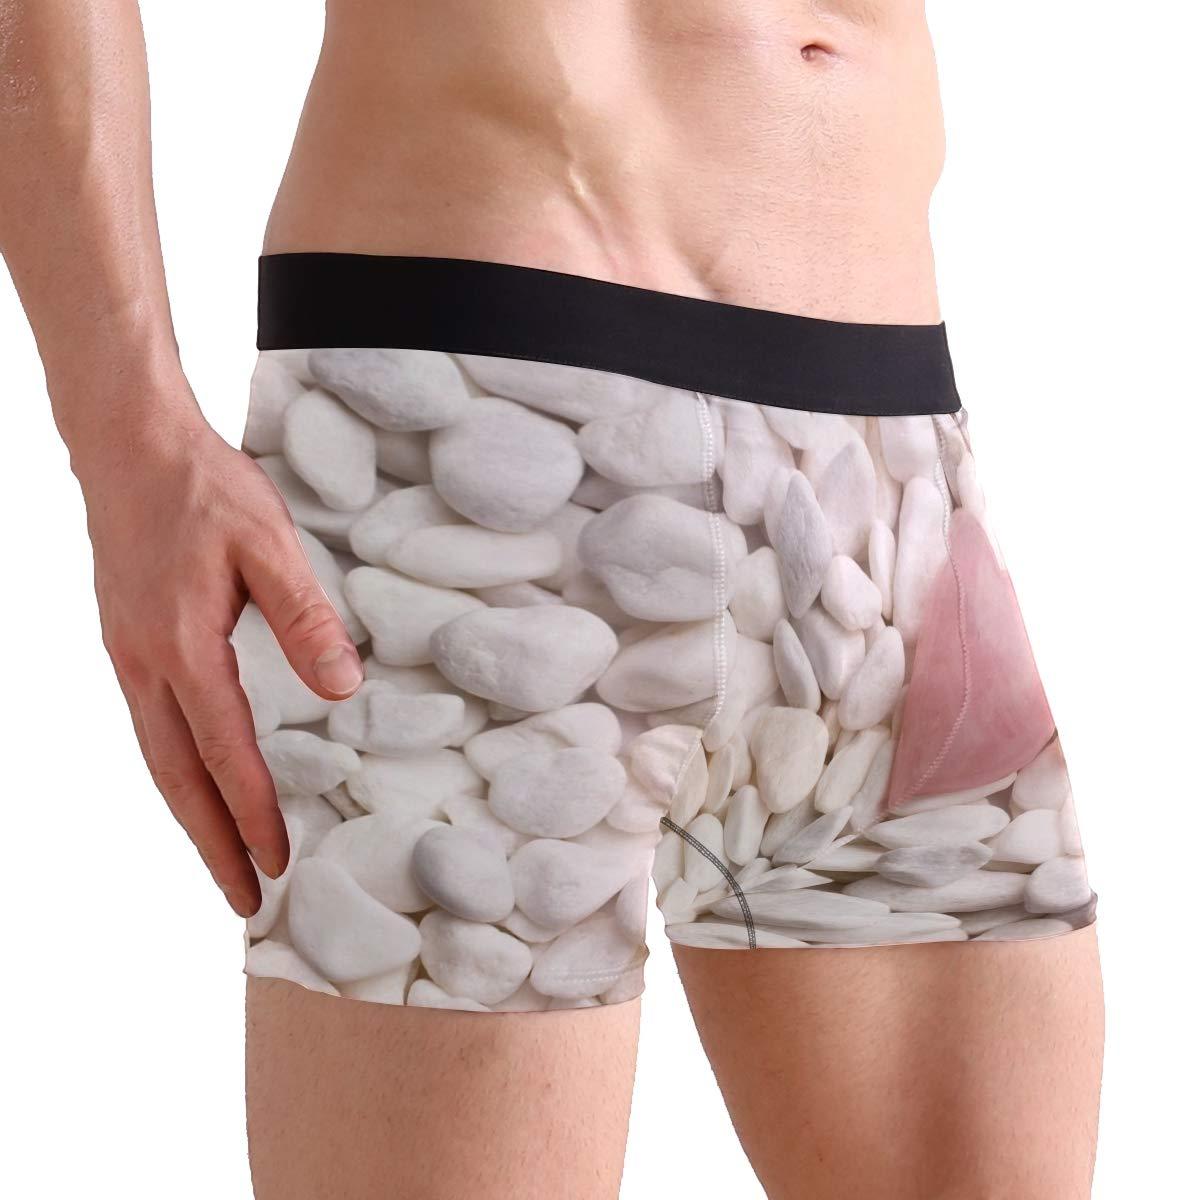 SUABO Mens 2-Pack Boxer Briefs Polyester Underwear Trunk Underwear with Rose Quartz Heart Design